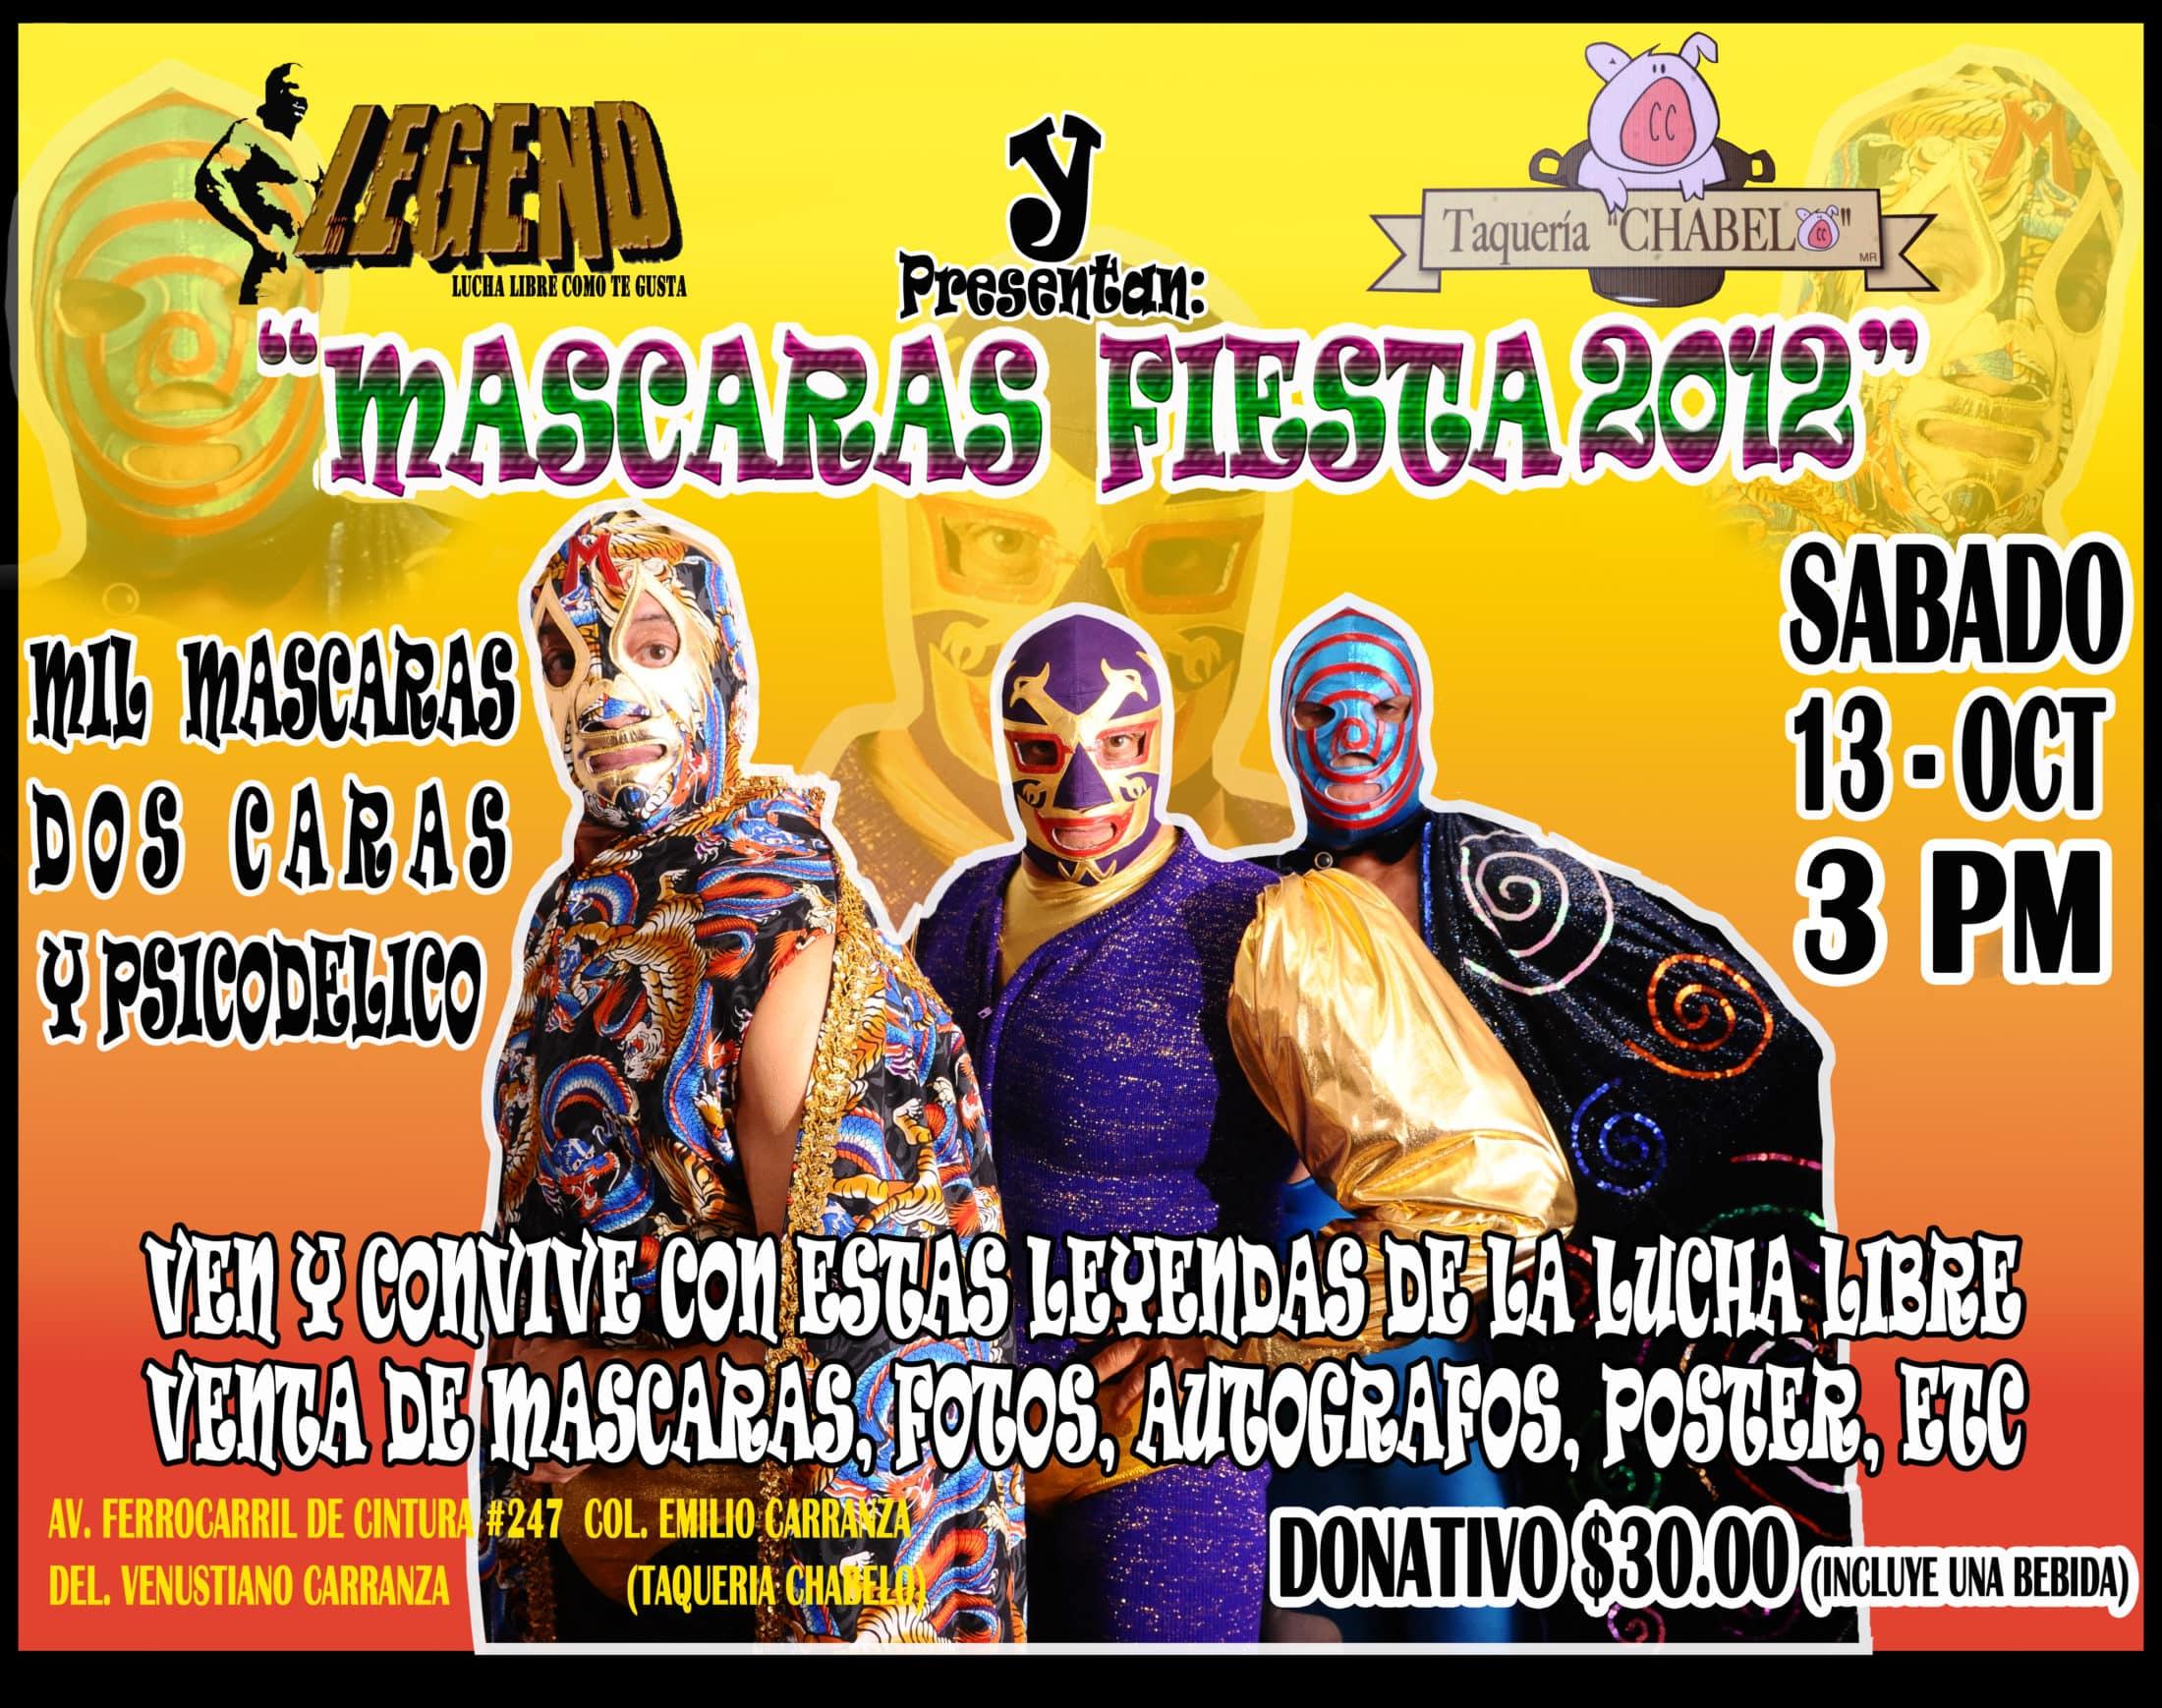 LEGEND: Máscaras Fiesta 2012